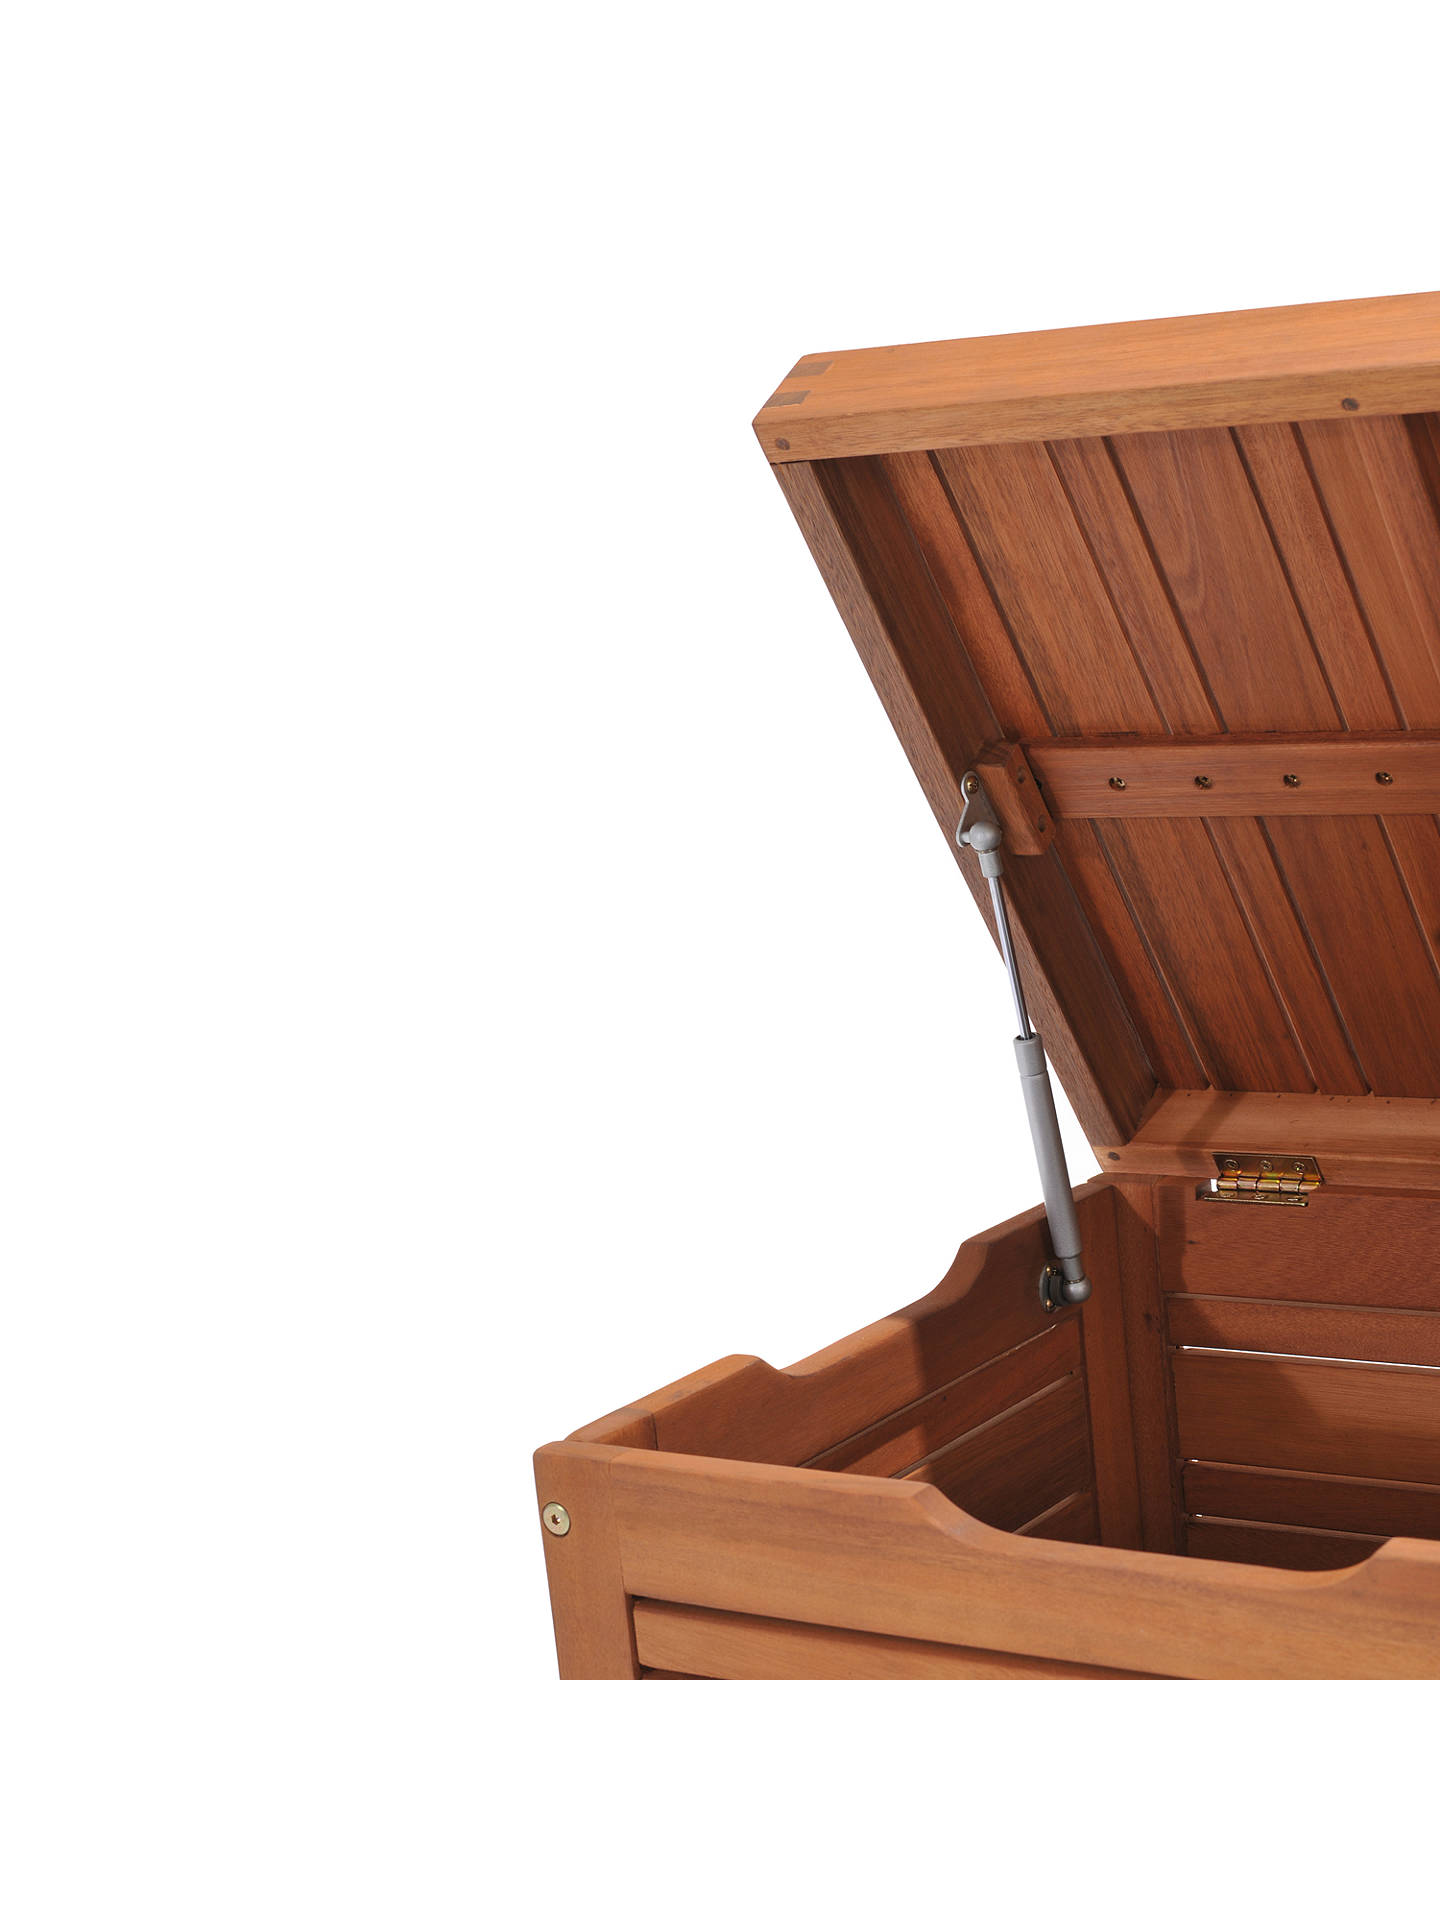 Super John Lewis Partners Venice Storage Box And Bench Fsc Certified Eucalyptus Wood Natural Inzonedesignstudio Interior Chair Design Inzonedesignstudiocom